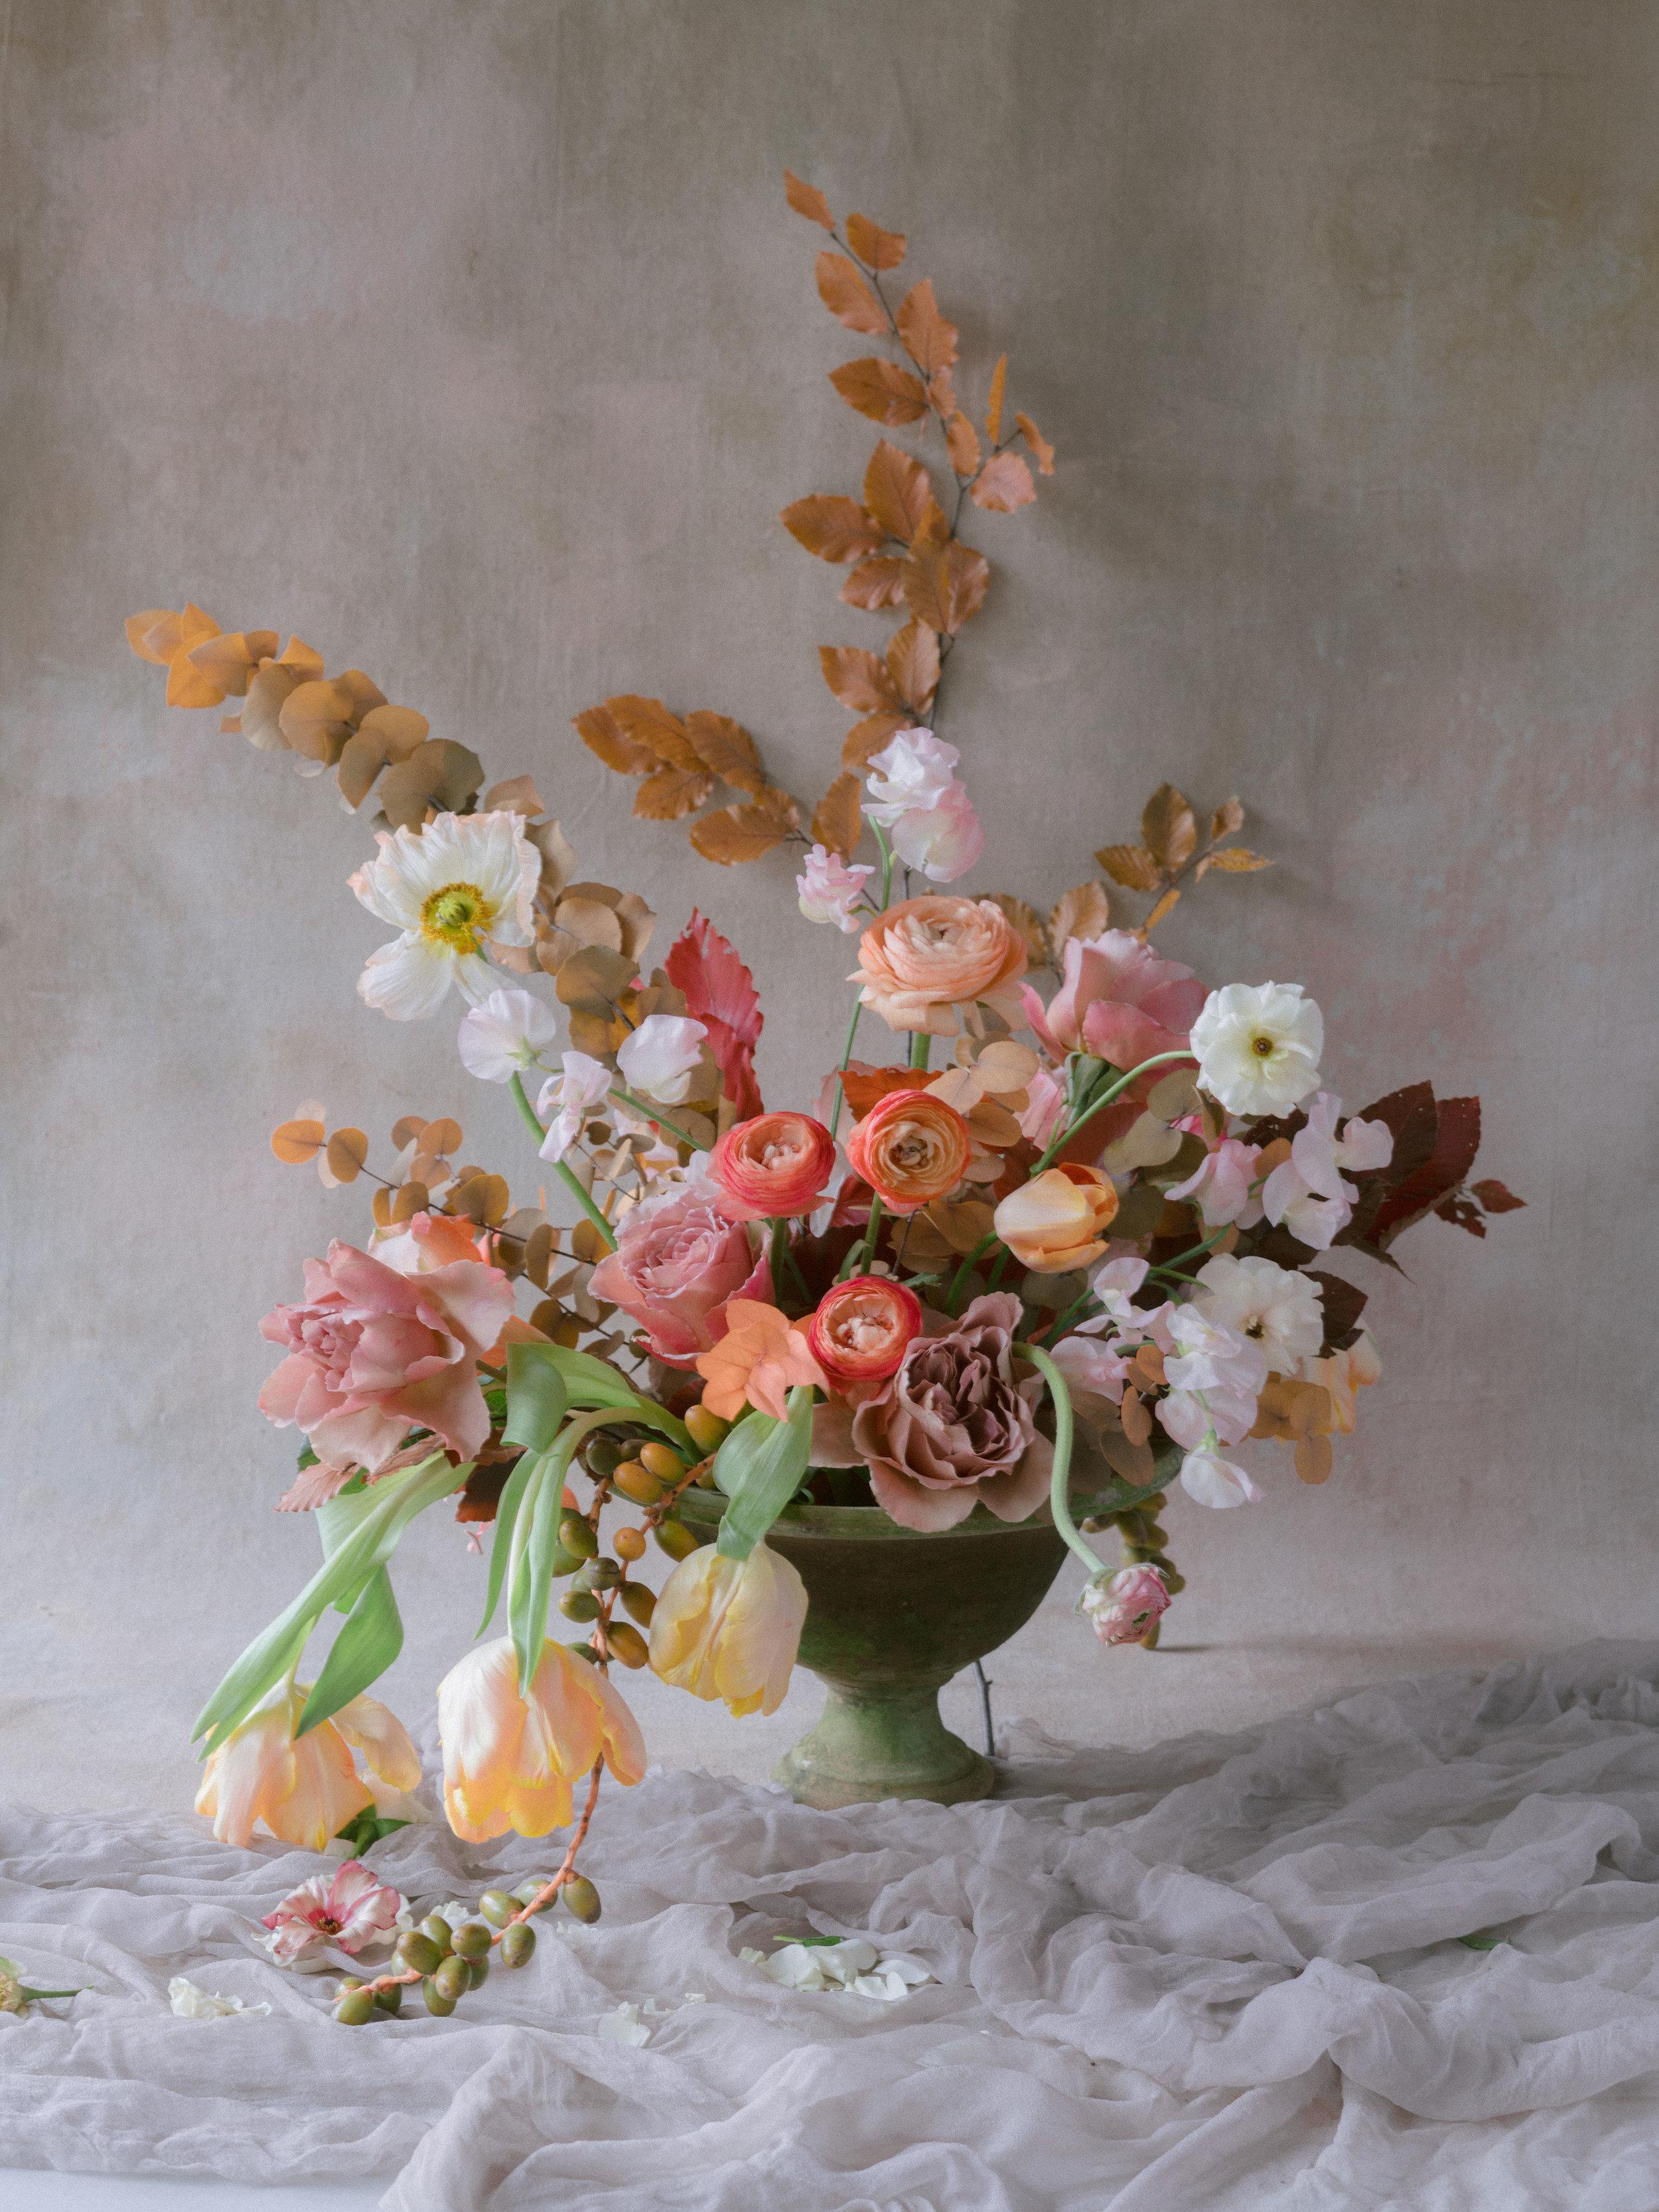 jessica-zimmerman-events-florabundance-days-holly-chapple-tulipina-floral-demo.jpg